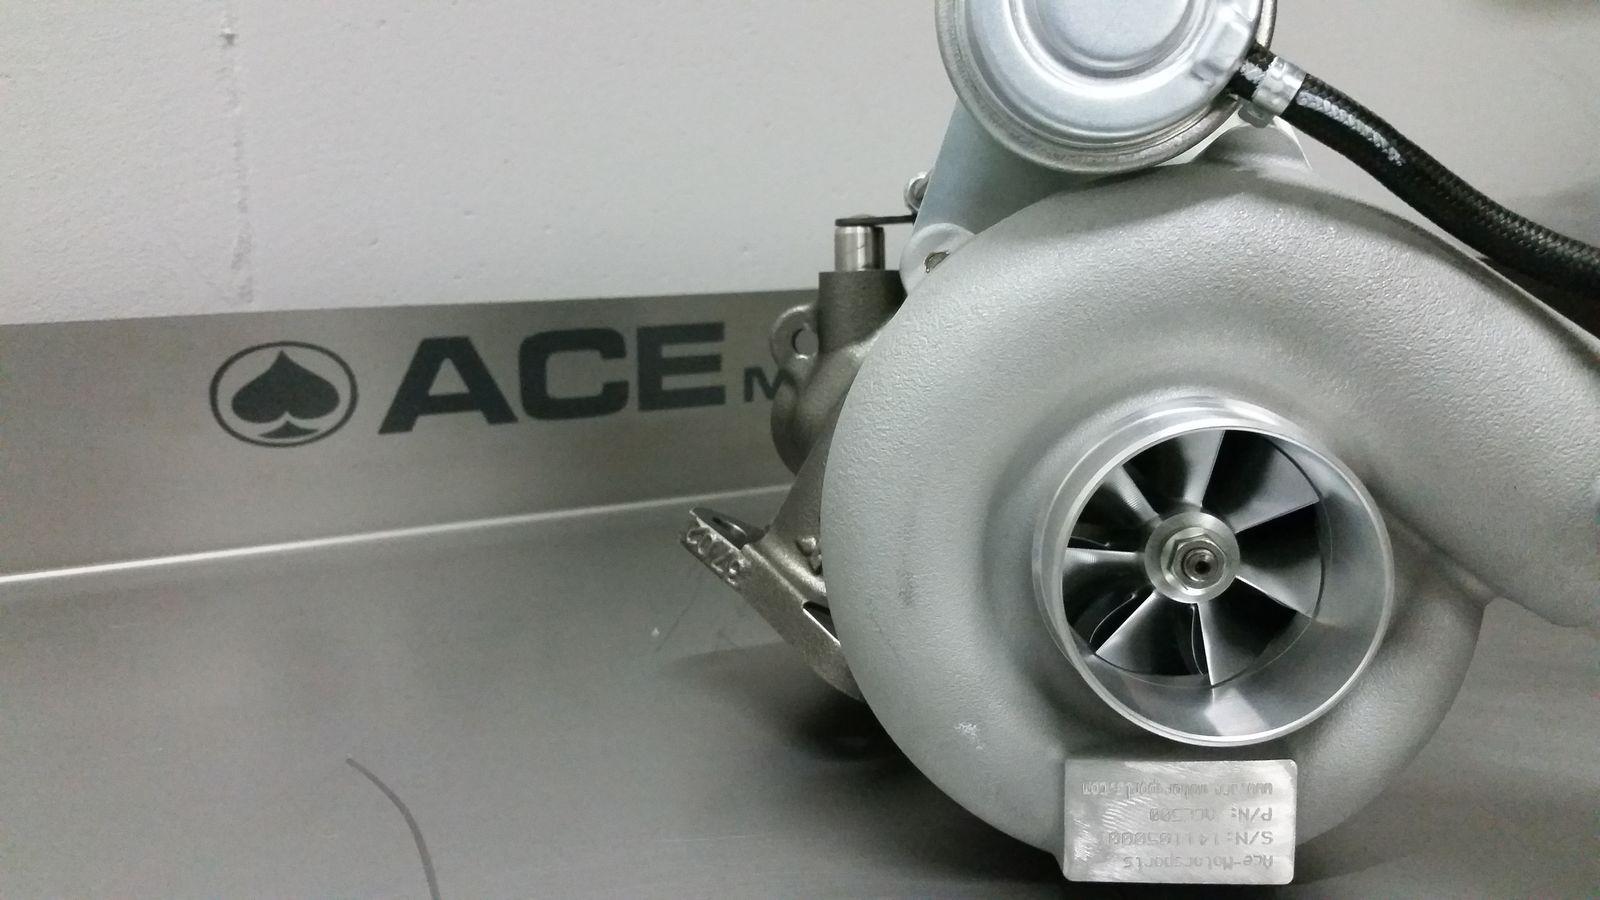 ACE400 bolt on turbo for Subaru